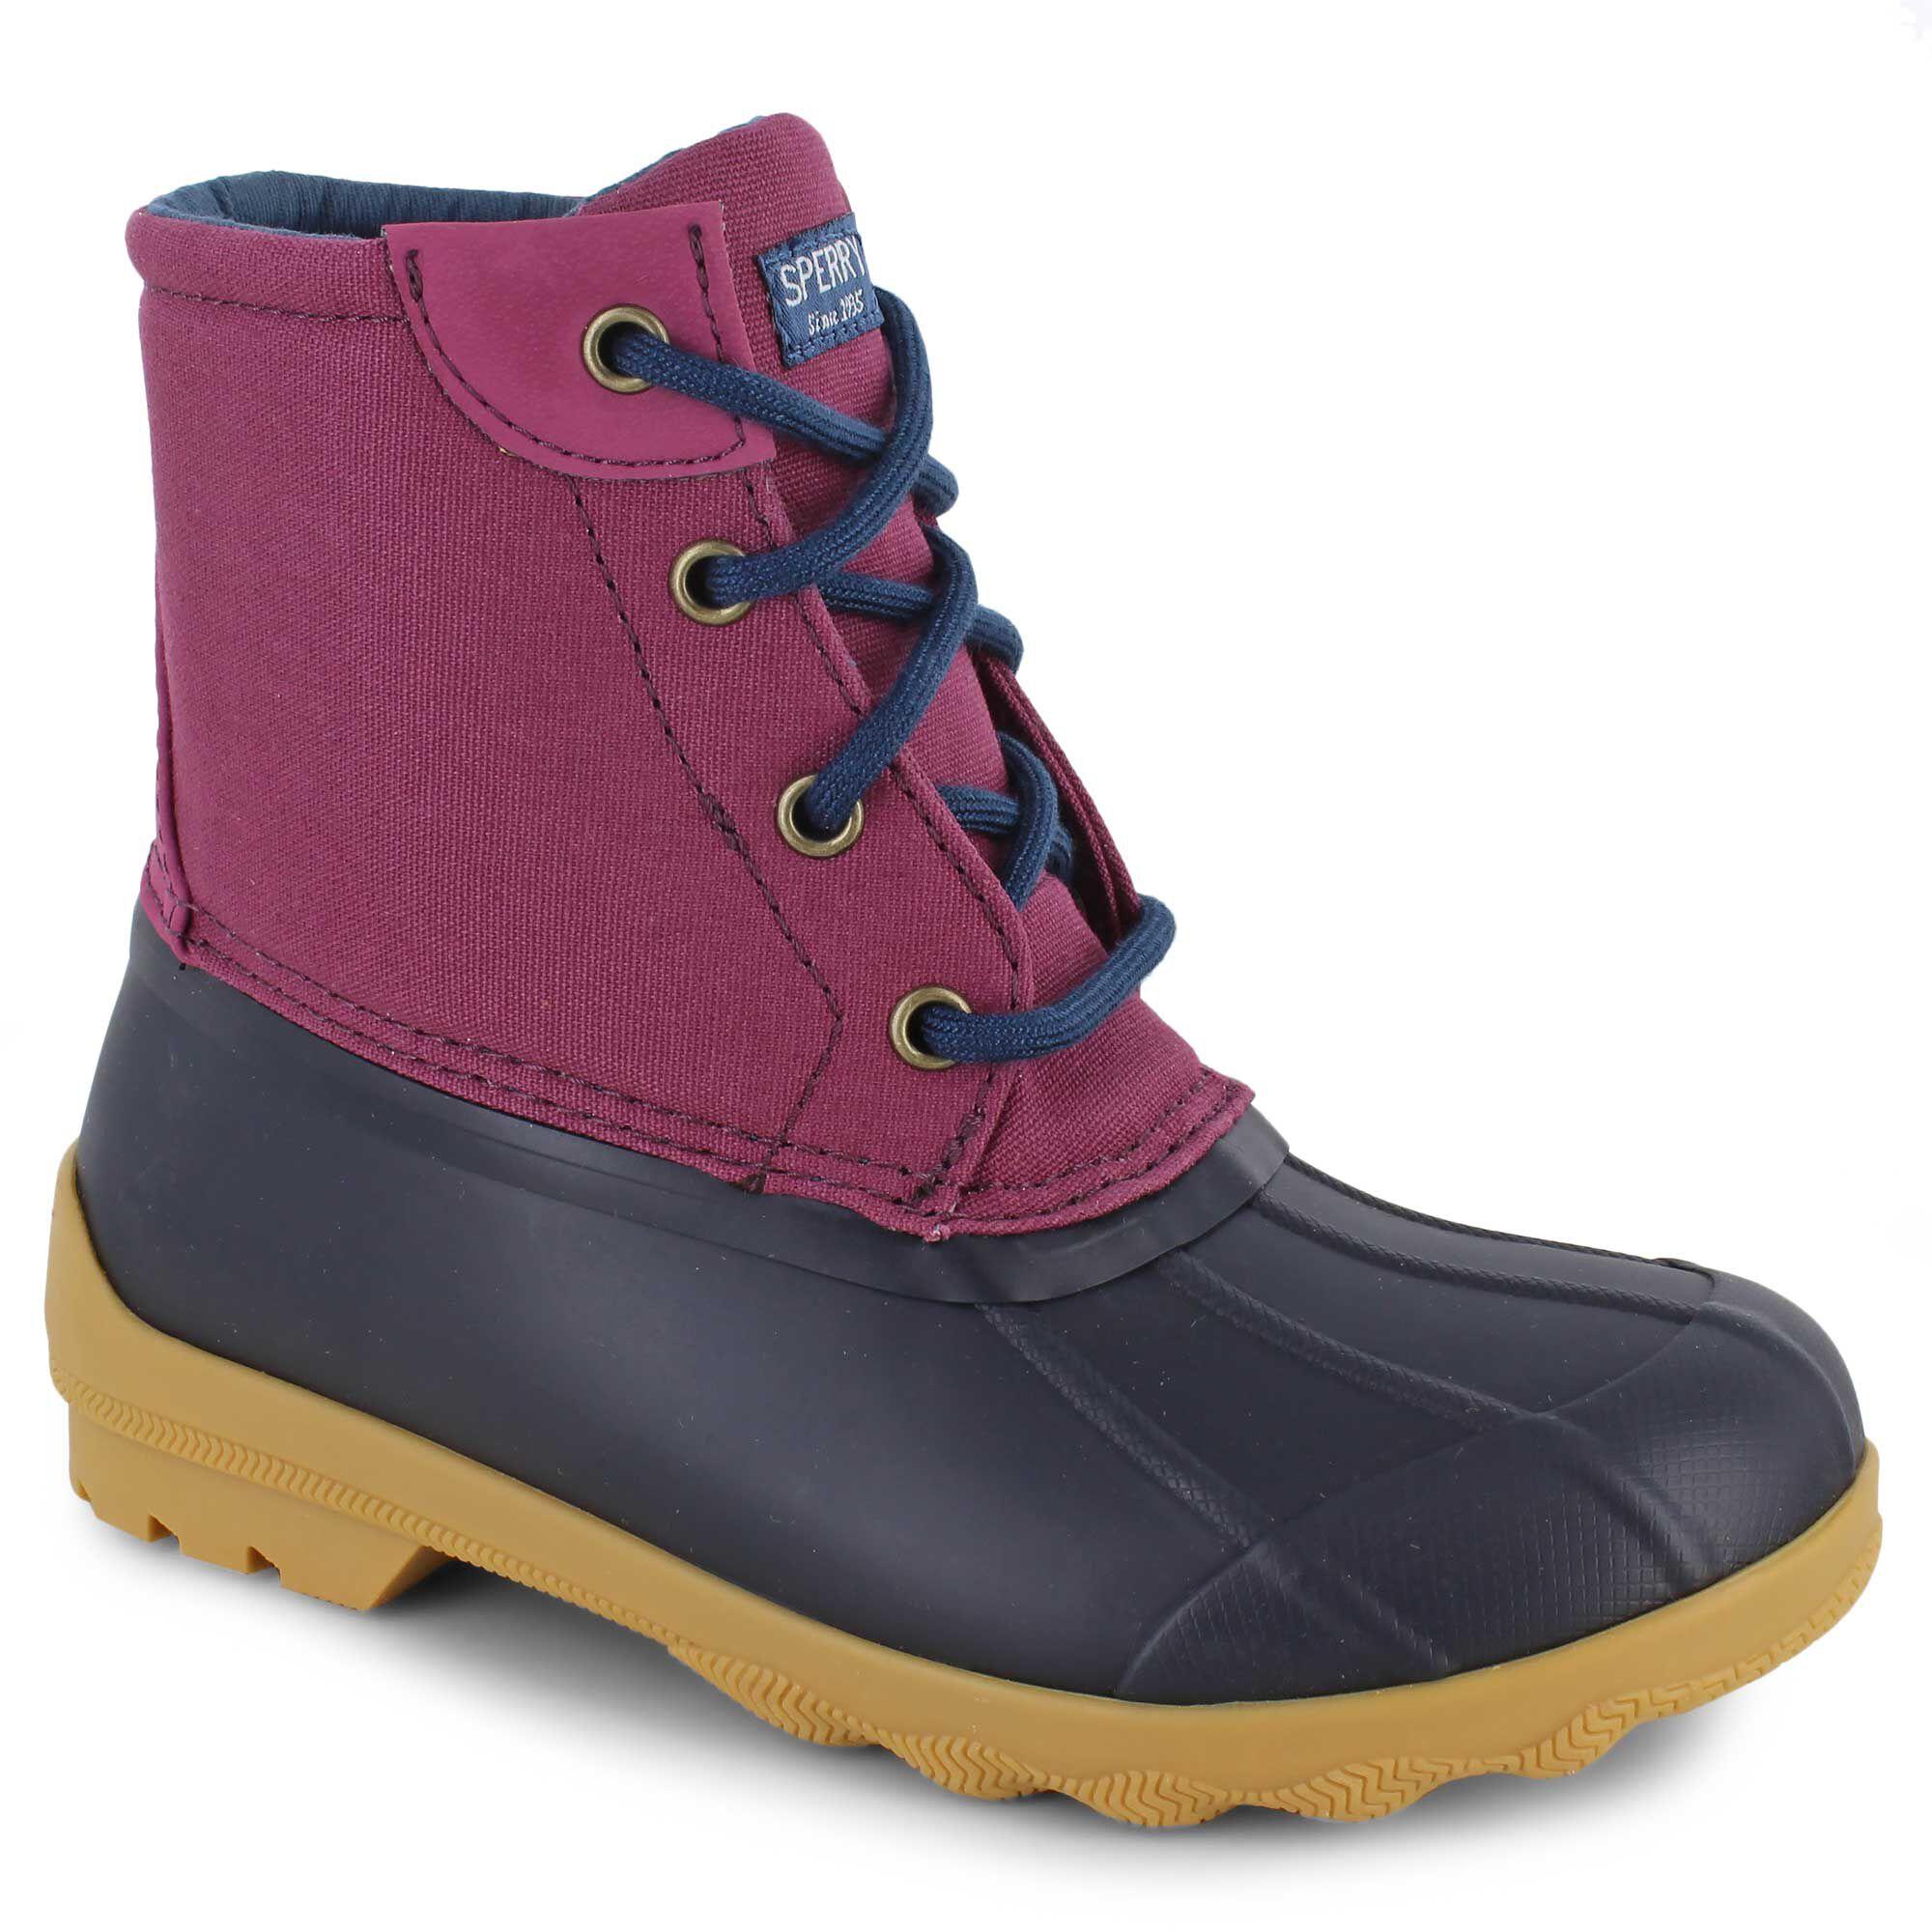 Girls' Boots | Shop Now at SHOE SHOW MEGA